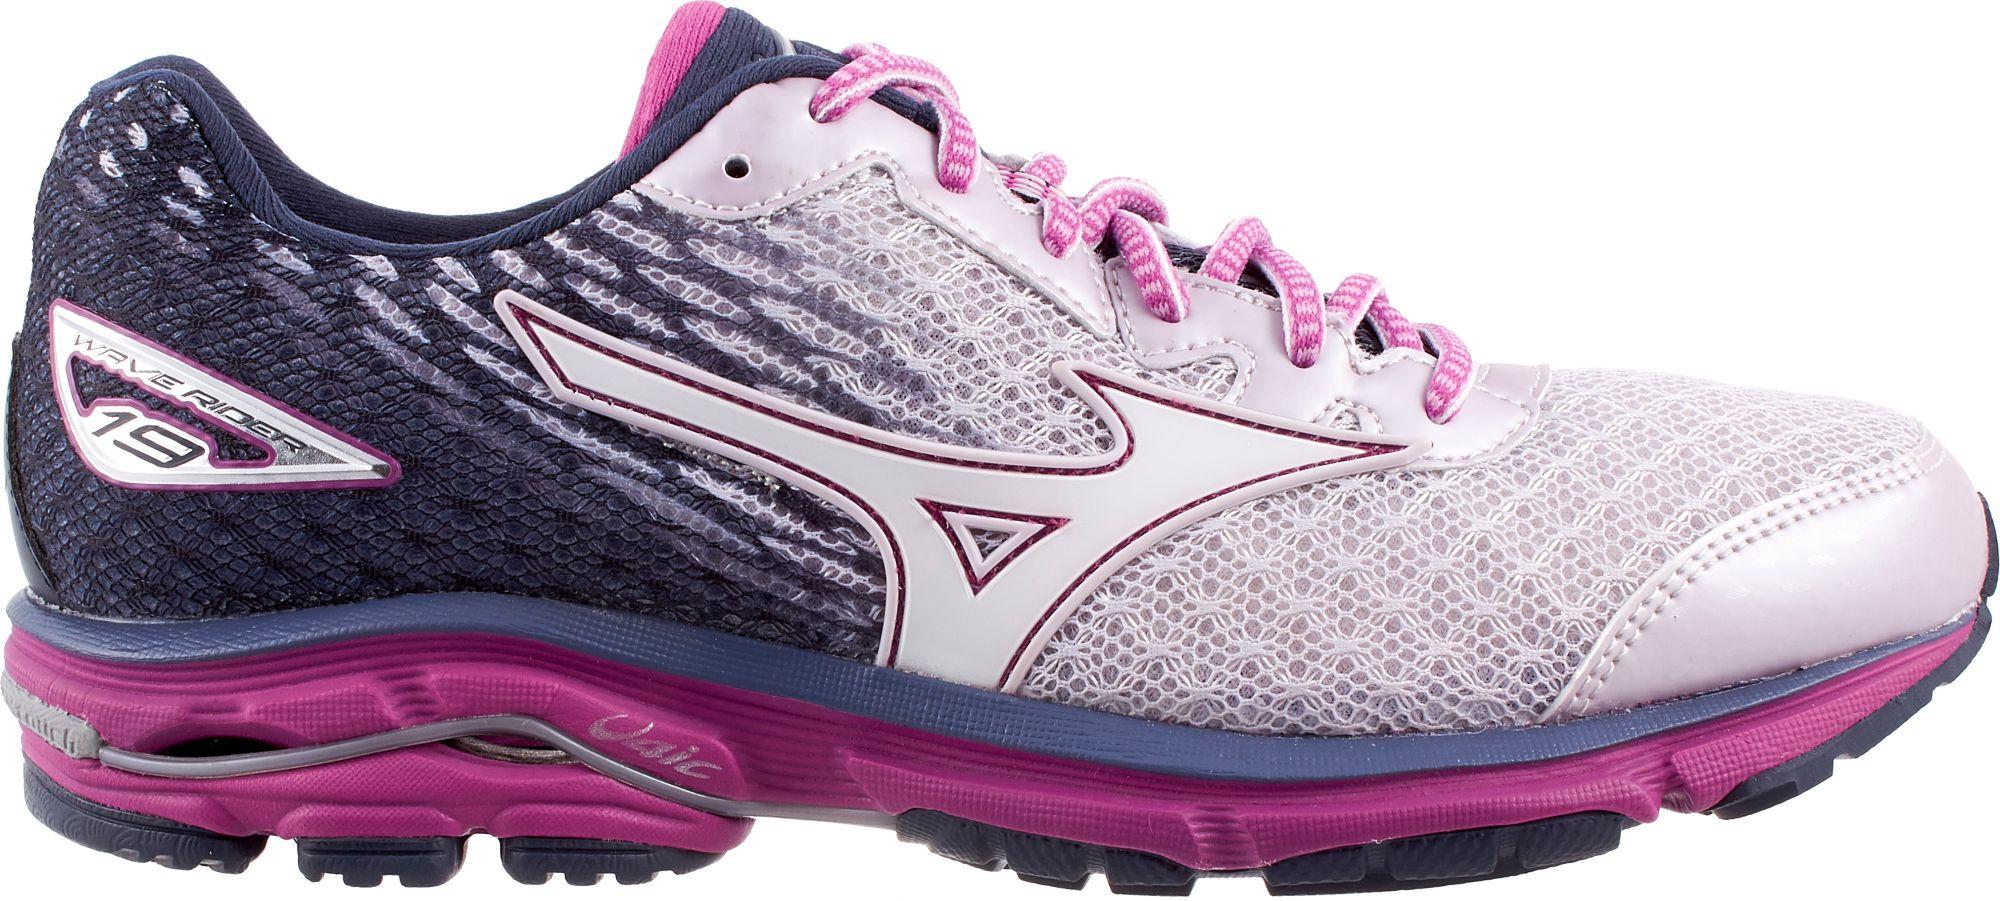 mizuno wave rider 16 women's running shoes